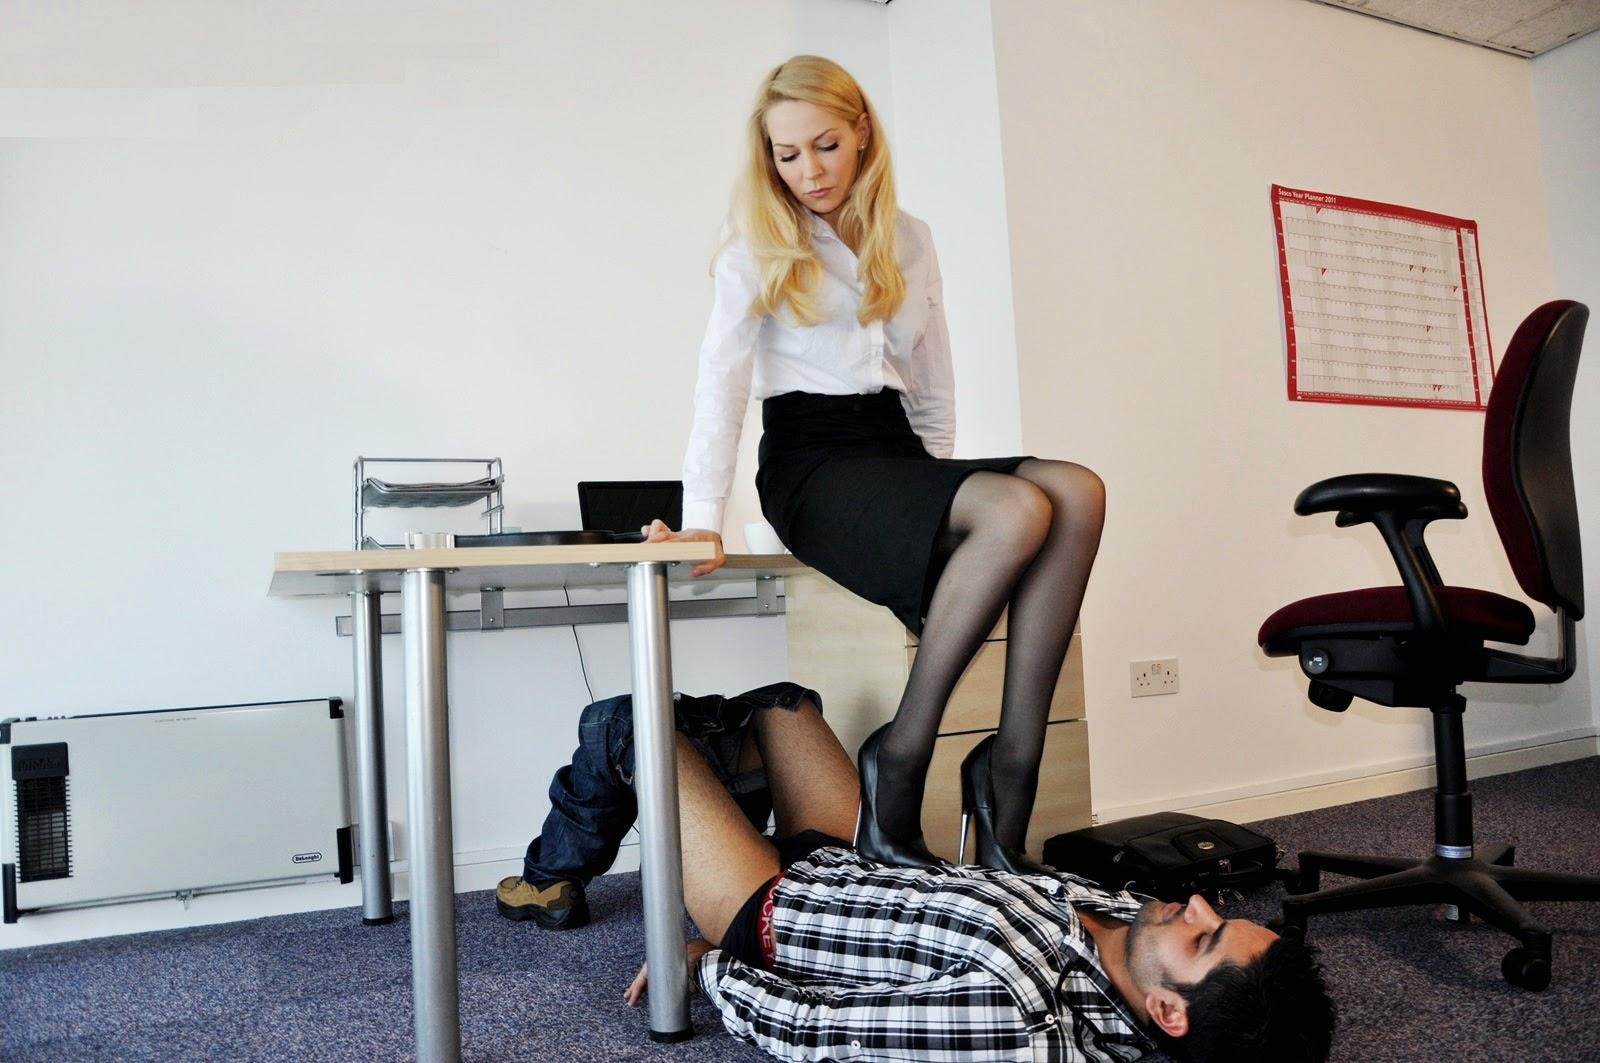 Blowjob humiliation vids